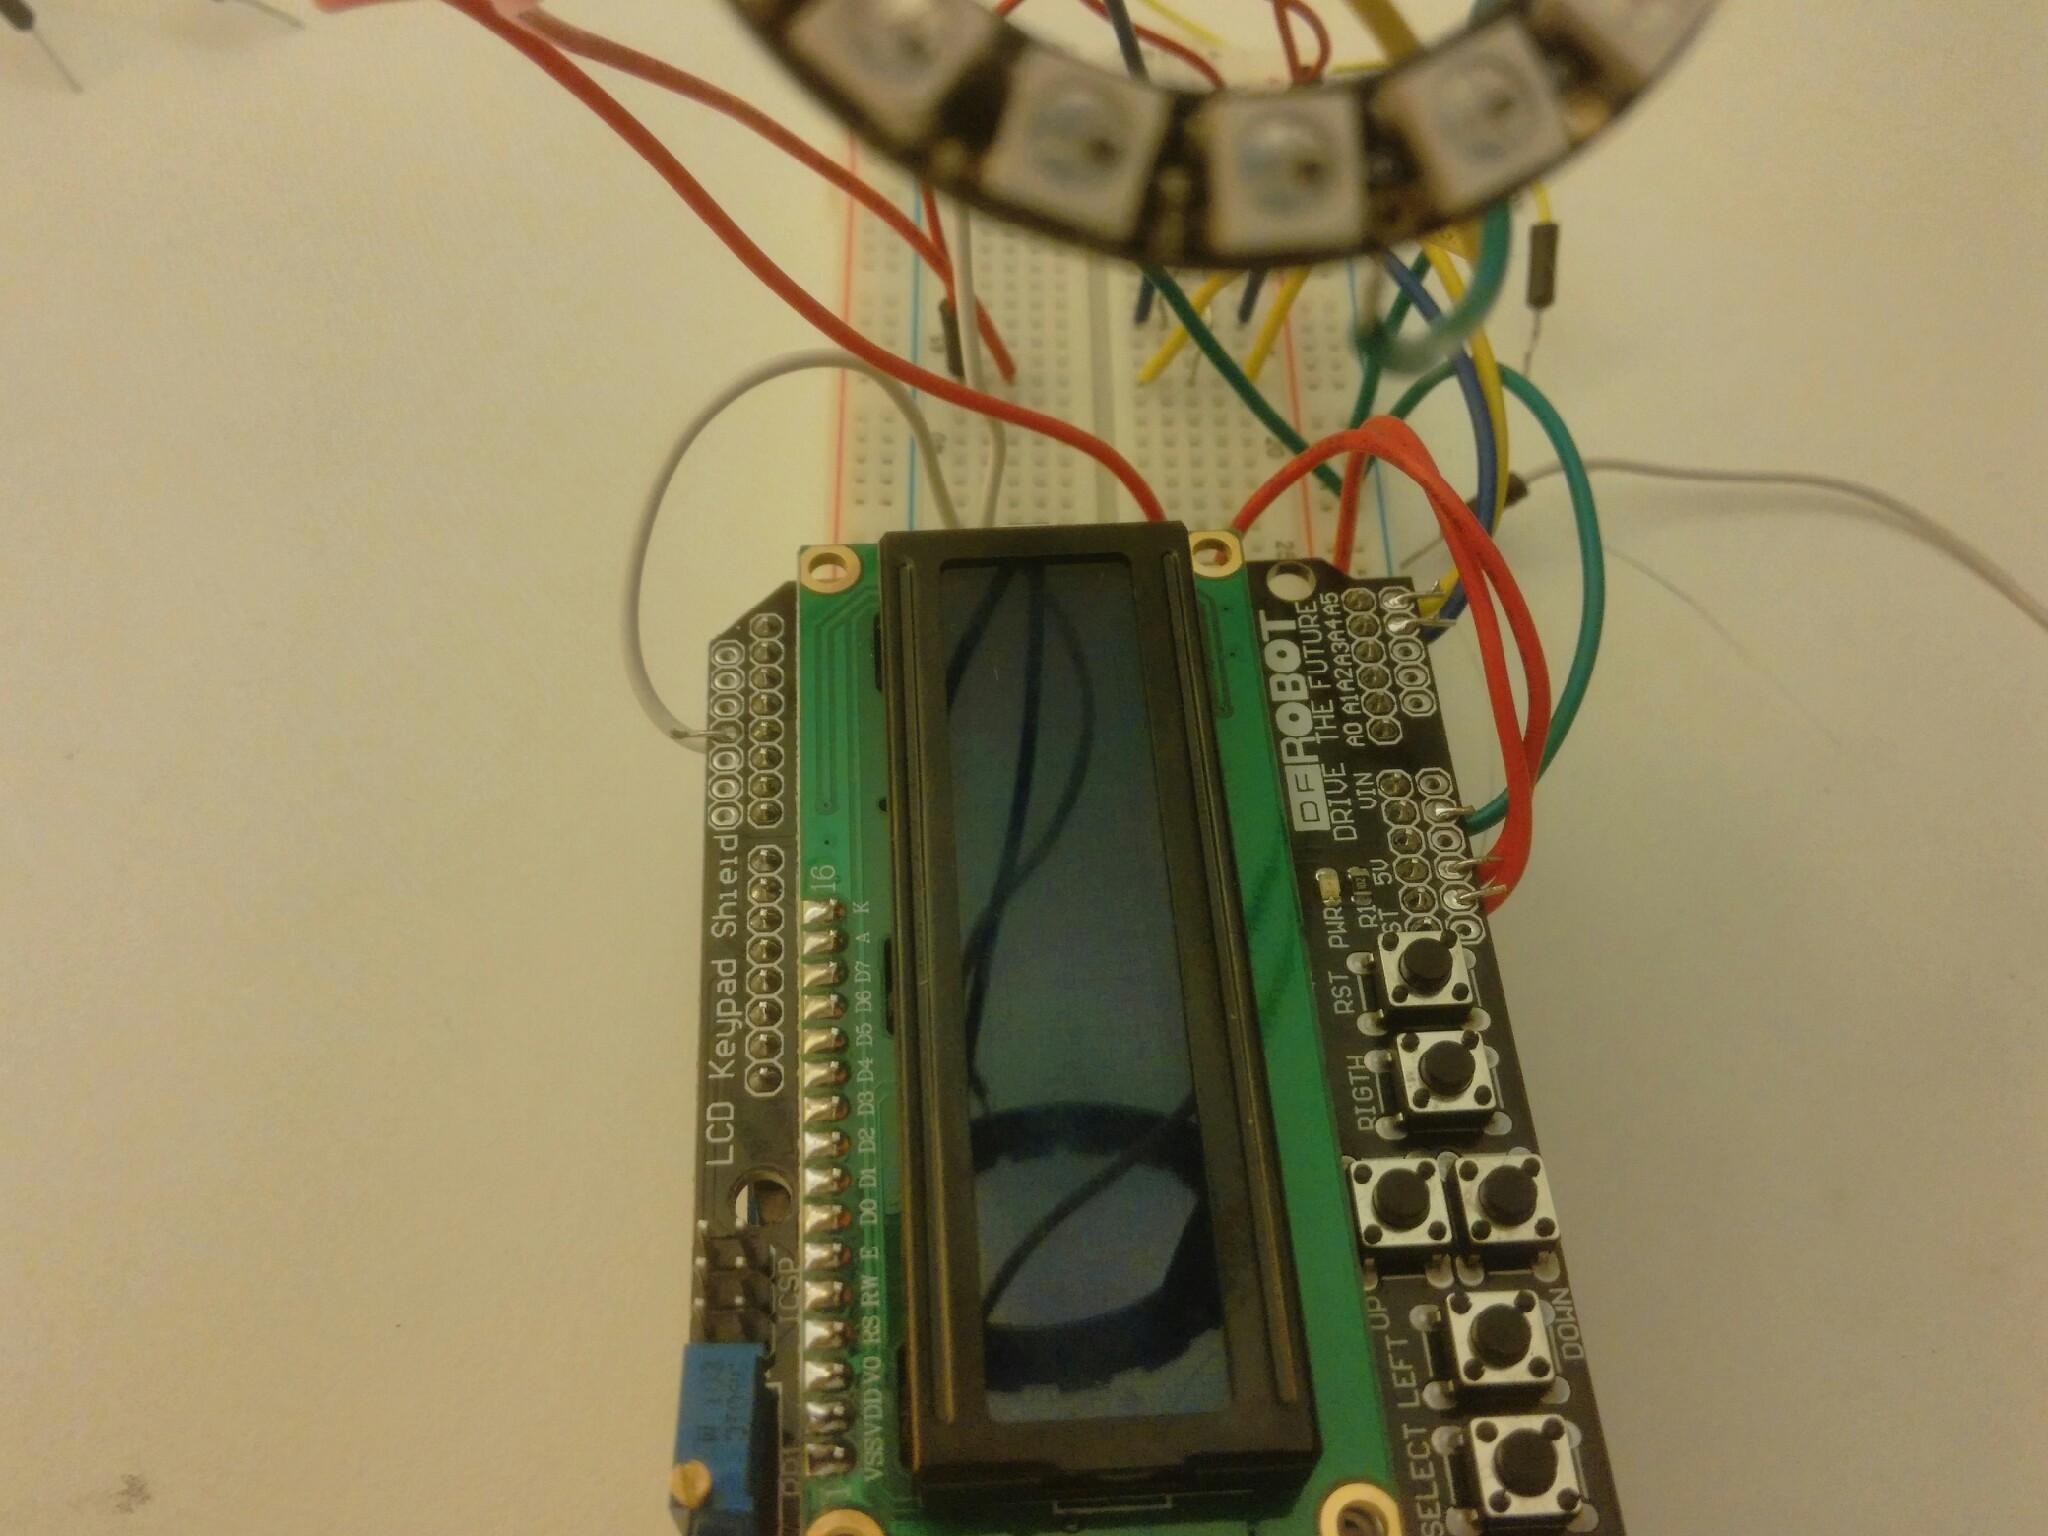 🎈 Public Lab: Thermal Flashlight with LCD keypad display